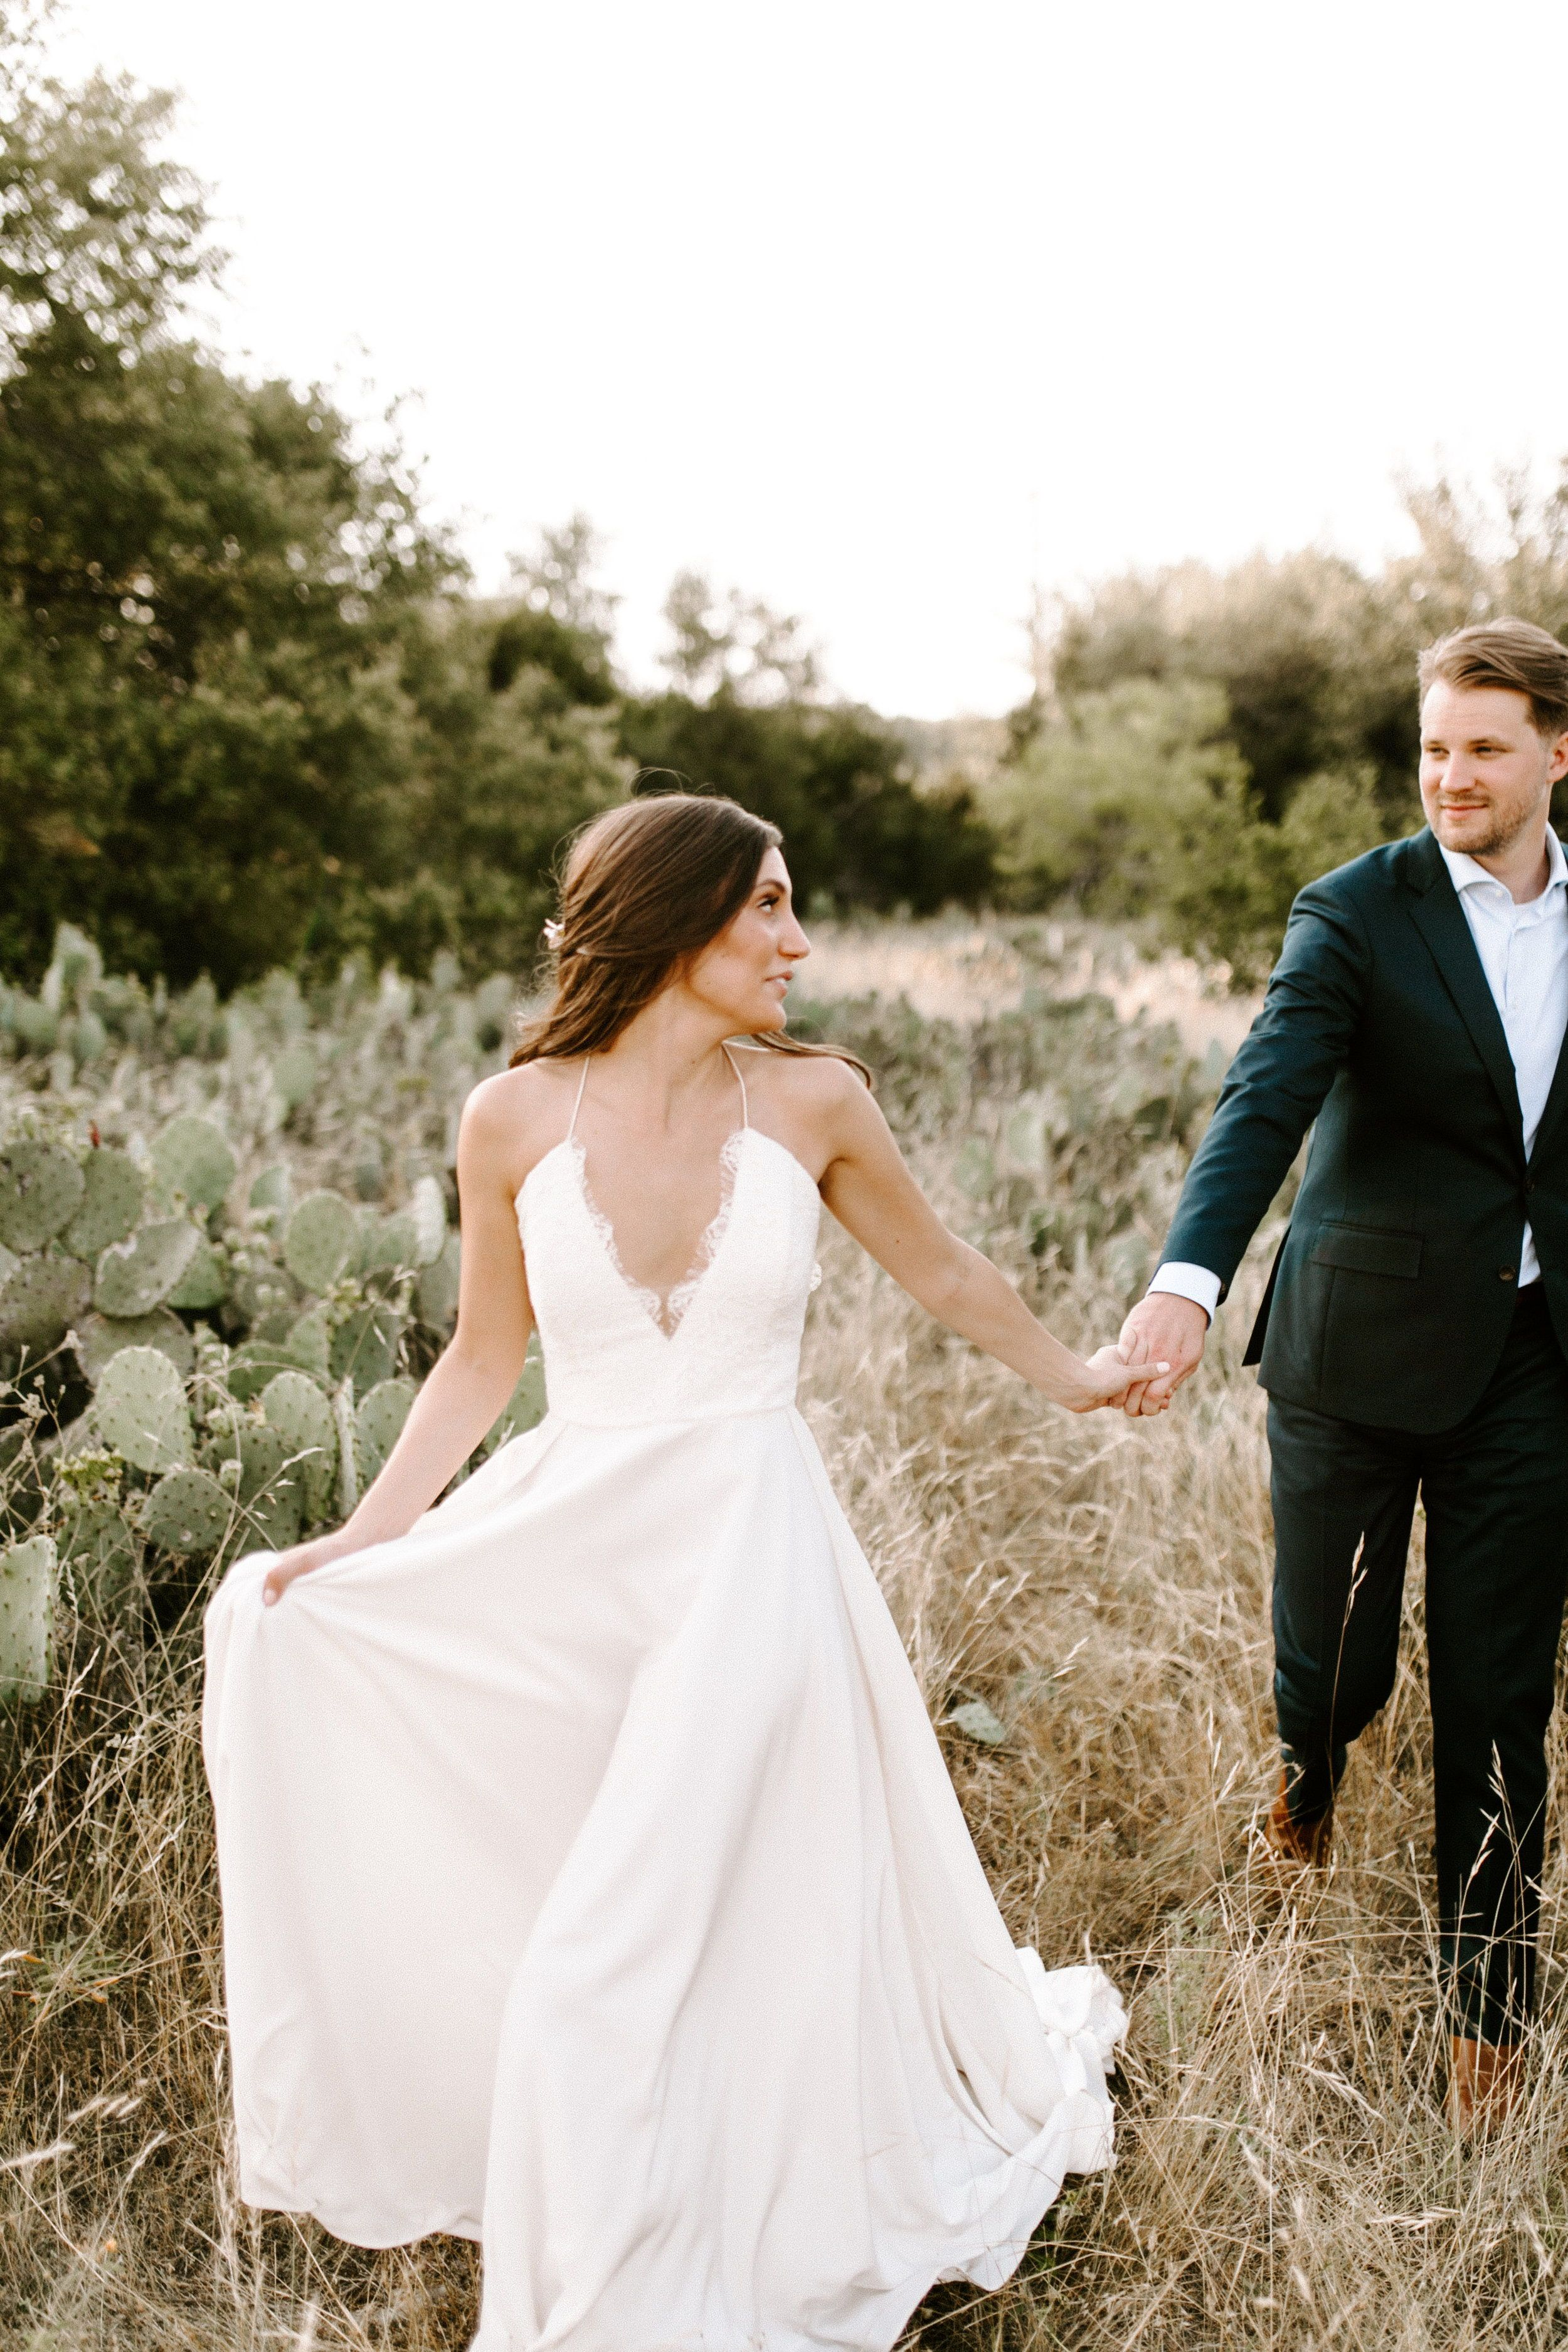 Real Wedding Kristina Grayson Simple Elegant Outdoor Wedding A Be Bridal Shop Simple Wedding Dress Boho Boho Wedding Dress Bohemian Wedding Dresses Lace